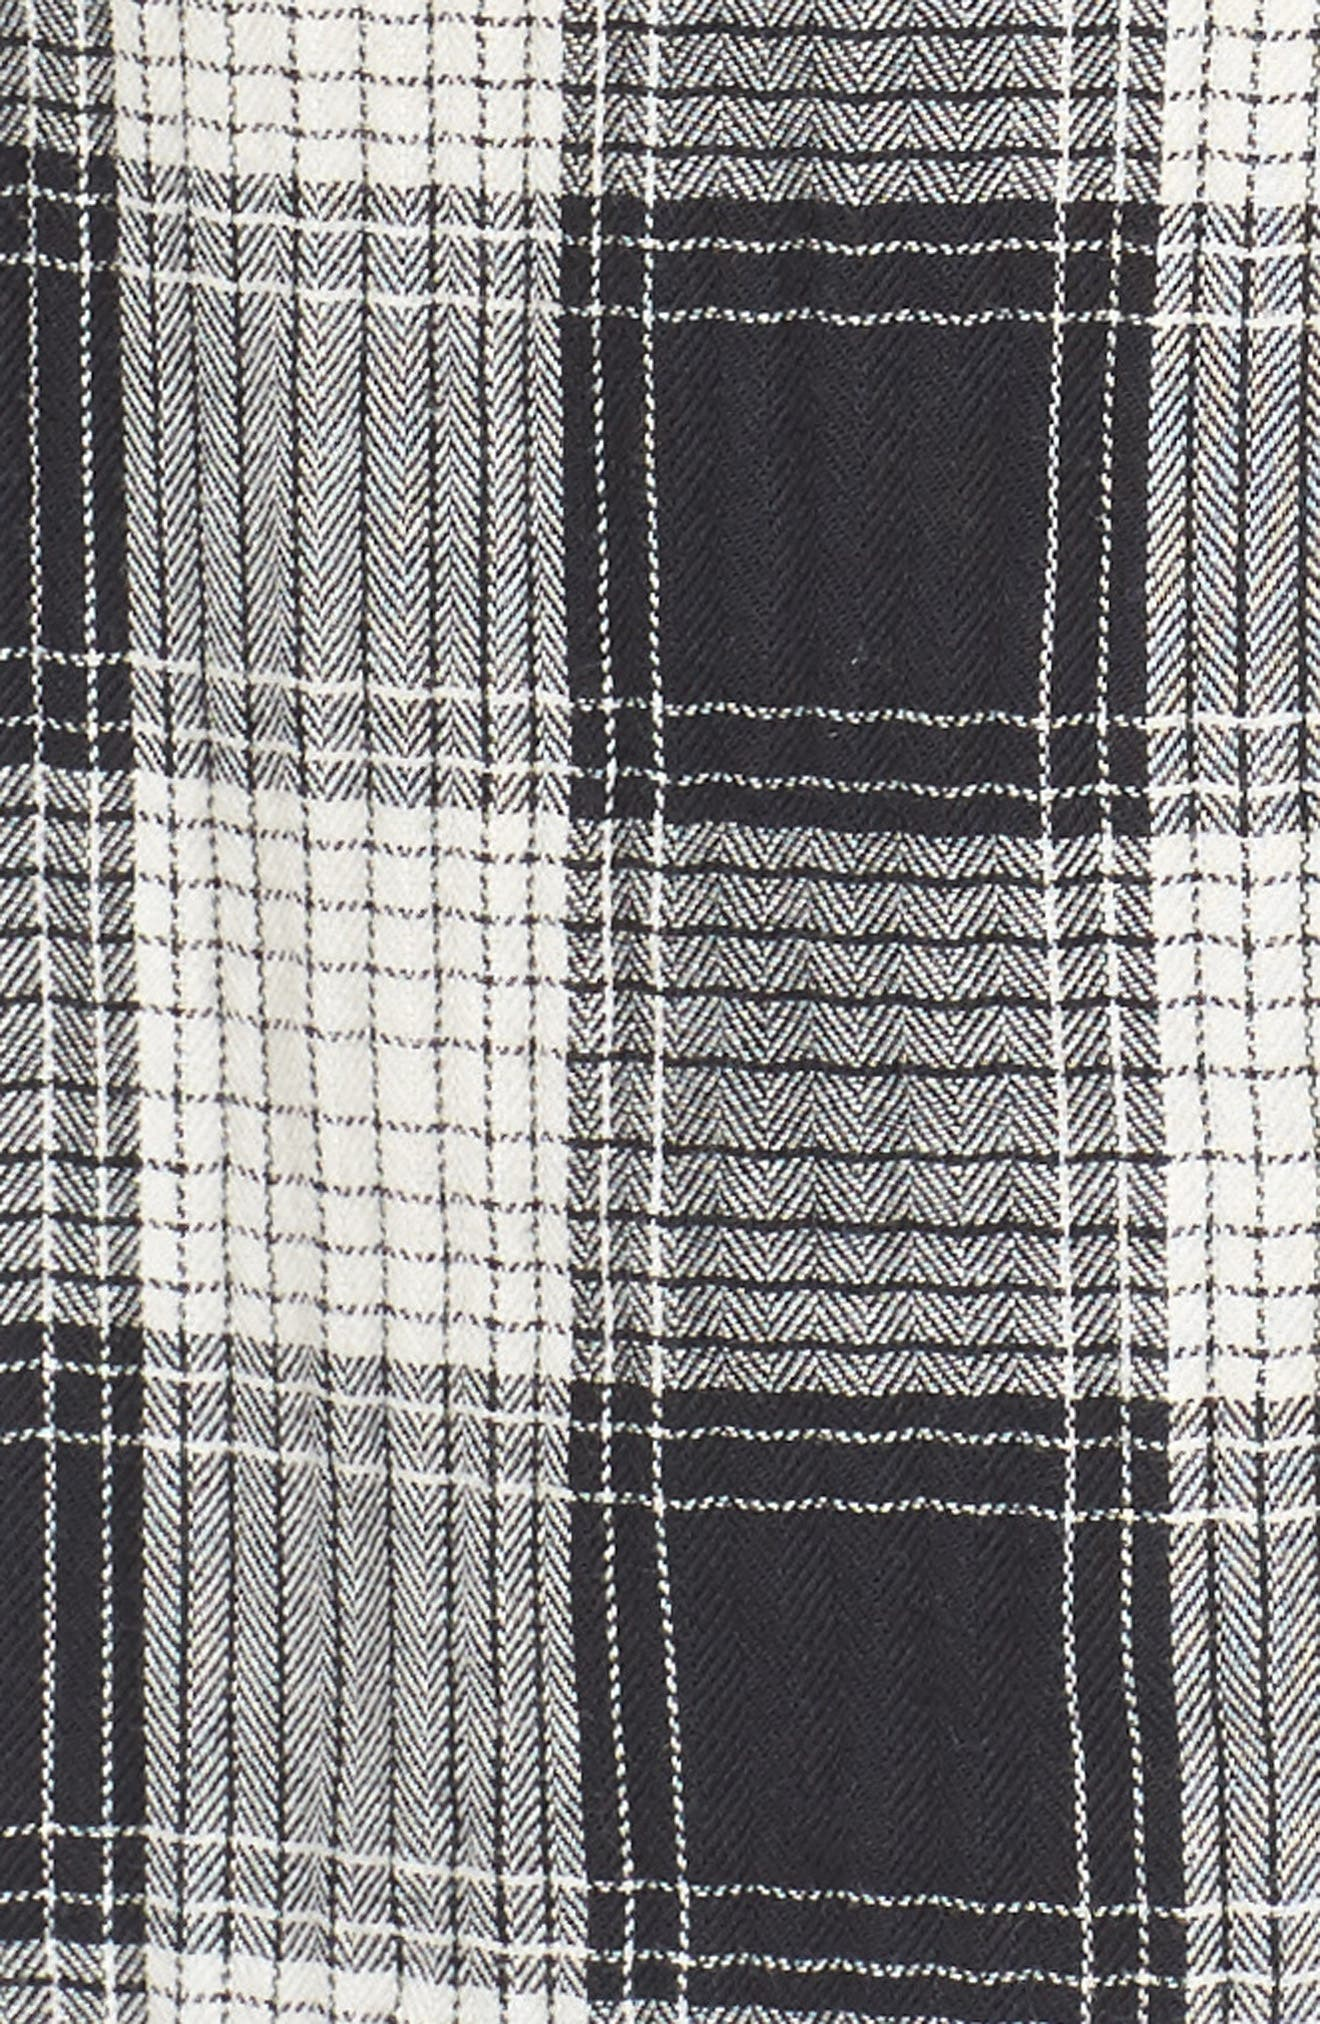 Herringbone Woven Plaid Shirt,                             Alternate thumbnail 5, color,                             100